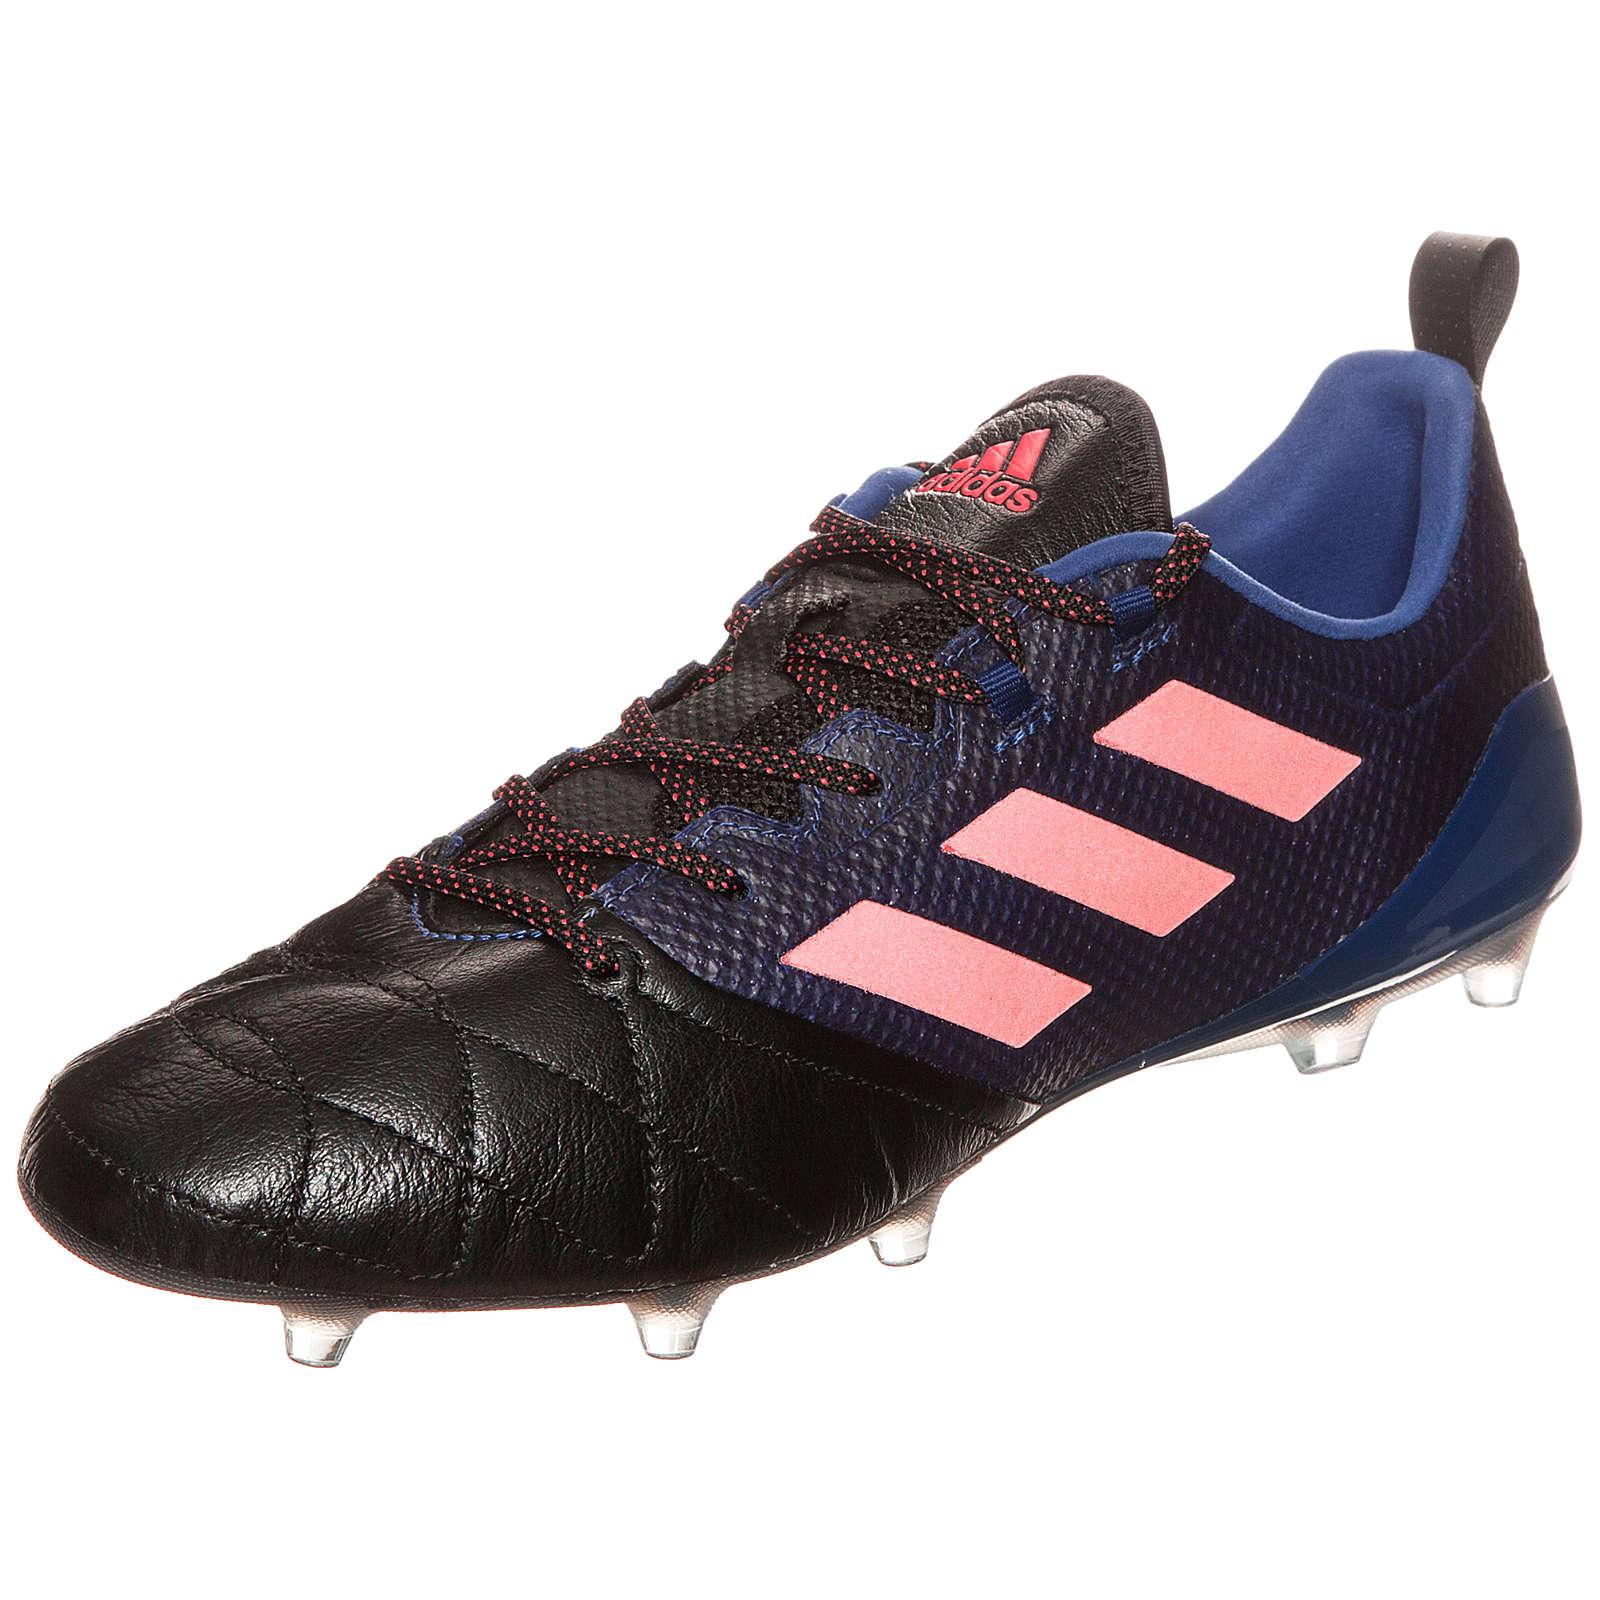 adidas Performance Sportschuhe ACE 17.1 schwarz Damen Gr. 41 1/3